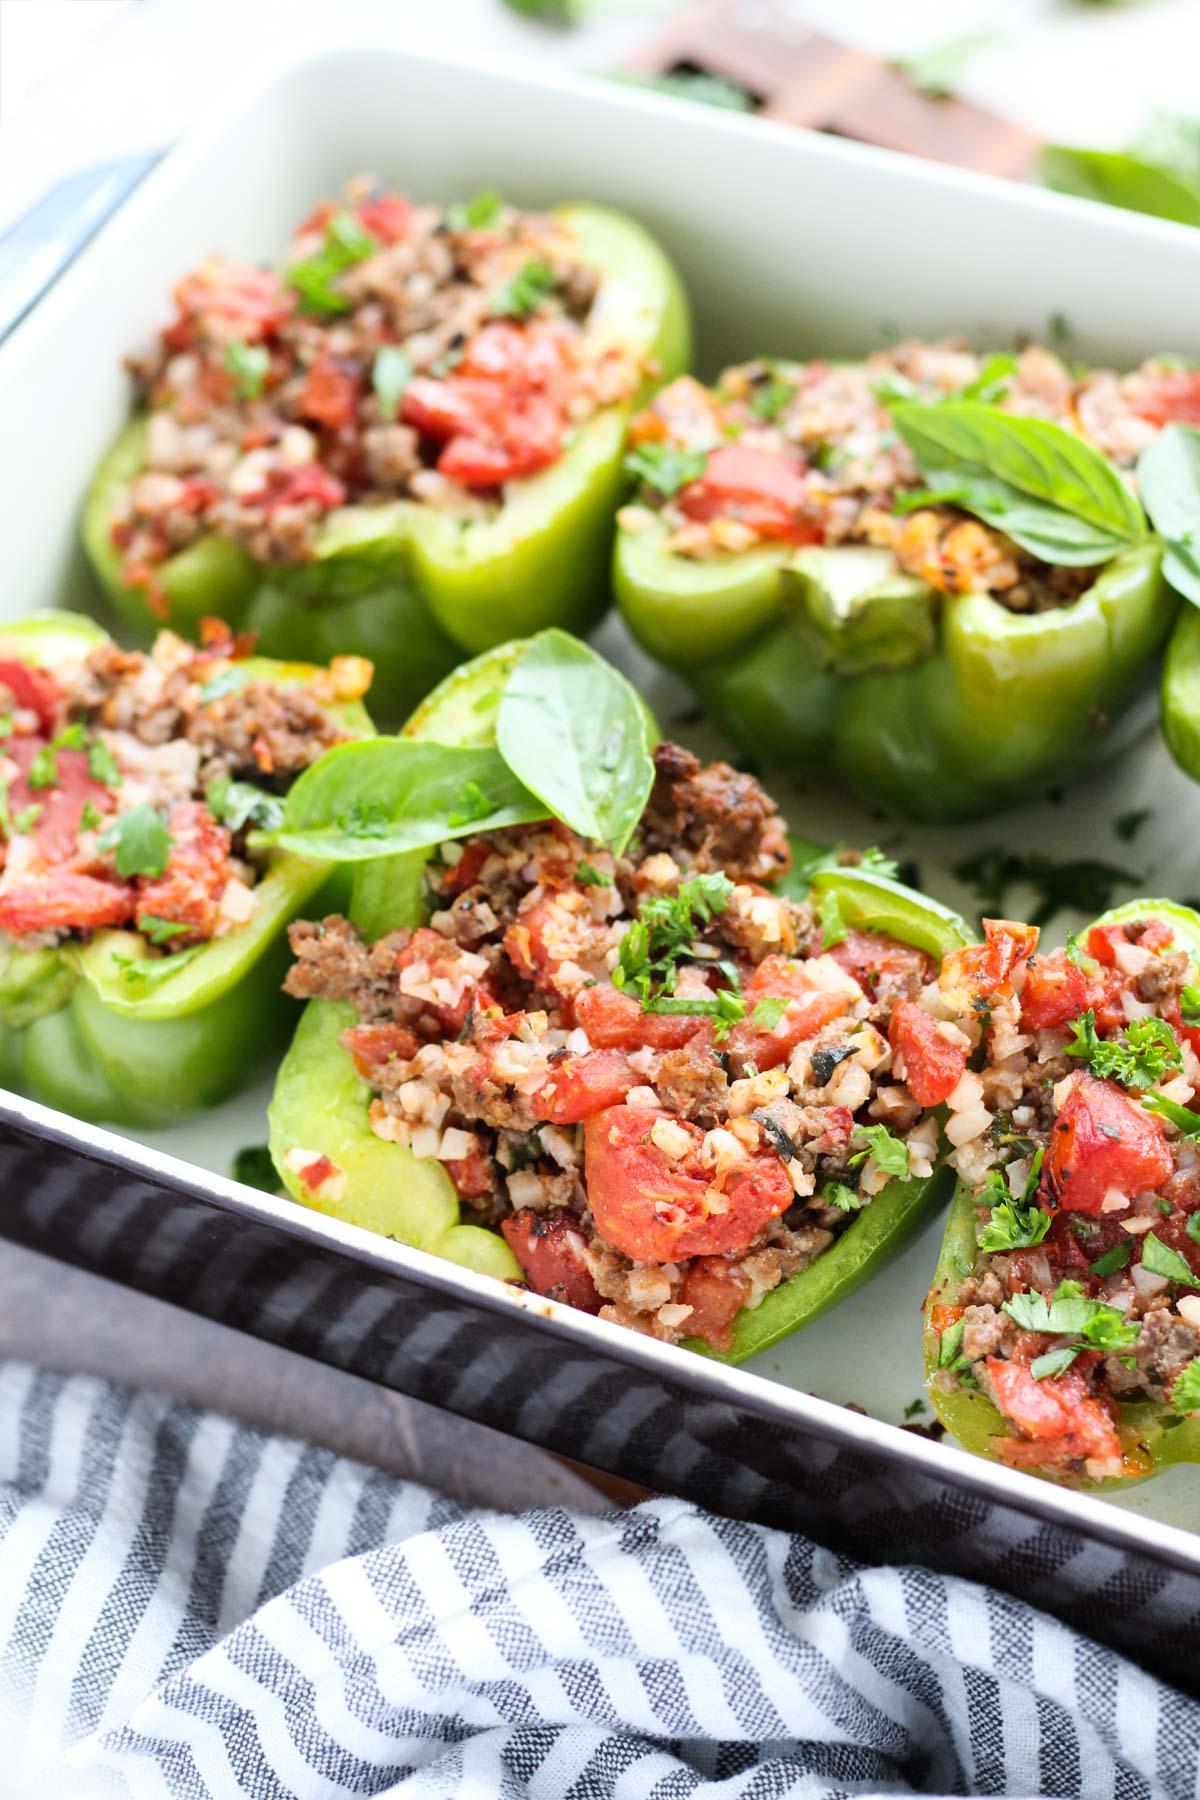 Stuffed peppers in a casserole dish.